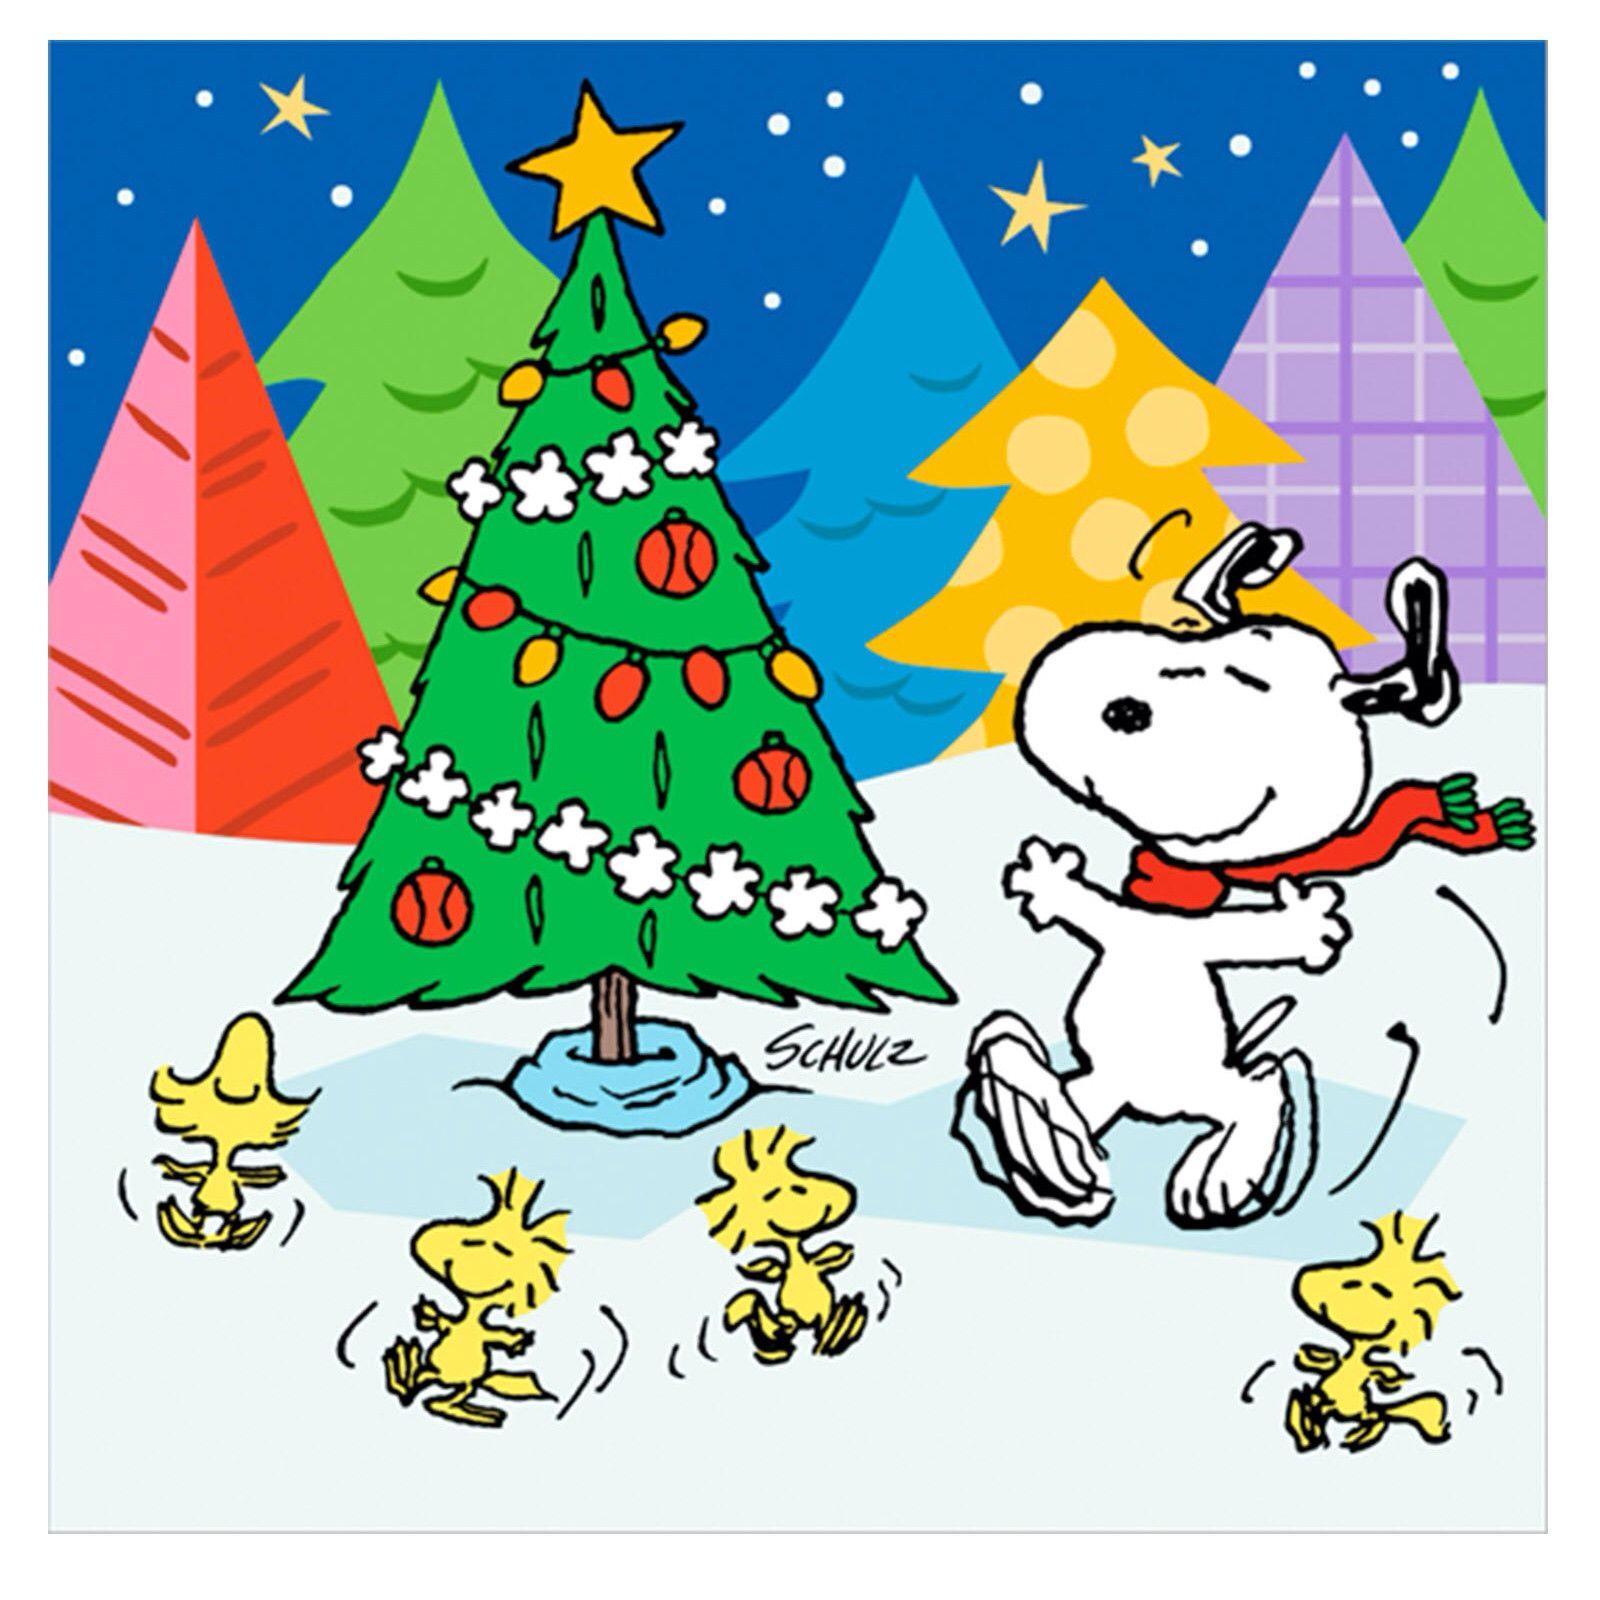 Snoopy Christmas Cards.Snoopy Happy Christmas Snoopy Christmas Peanuts